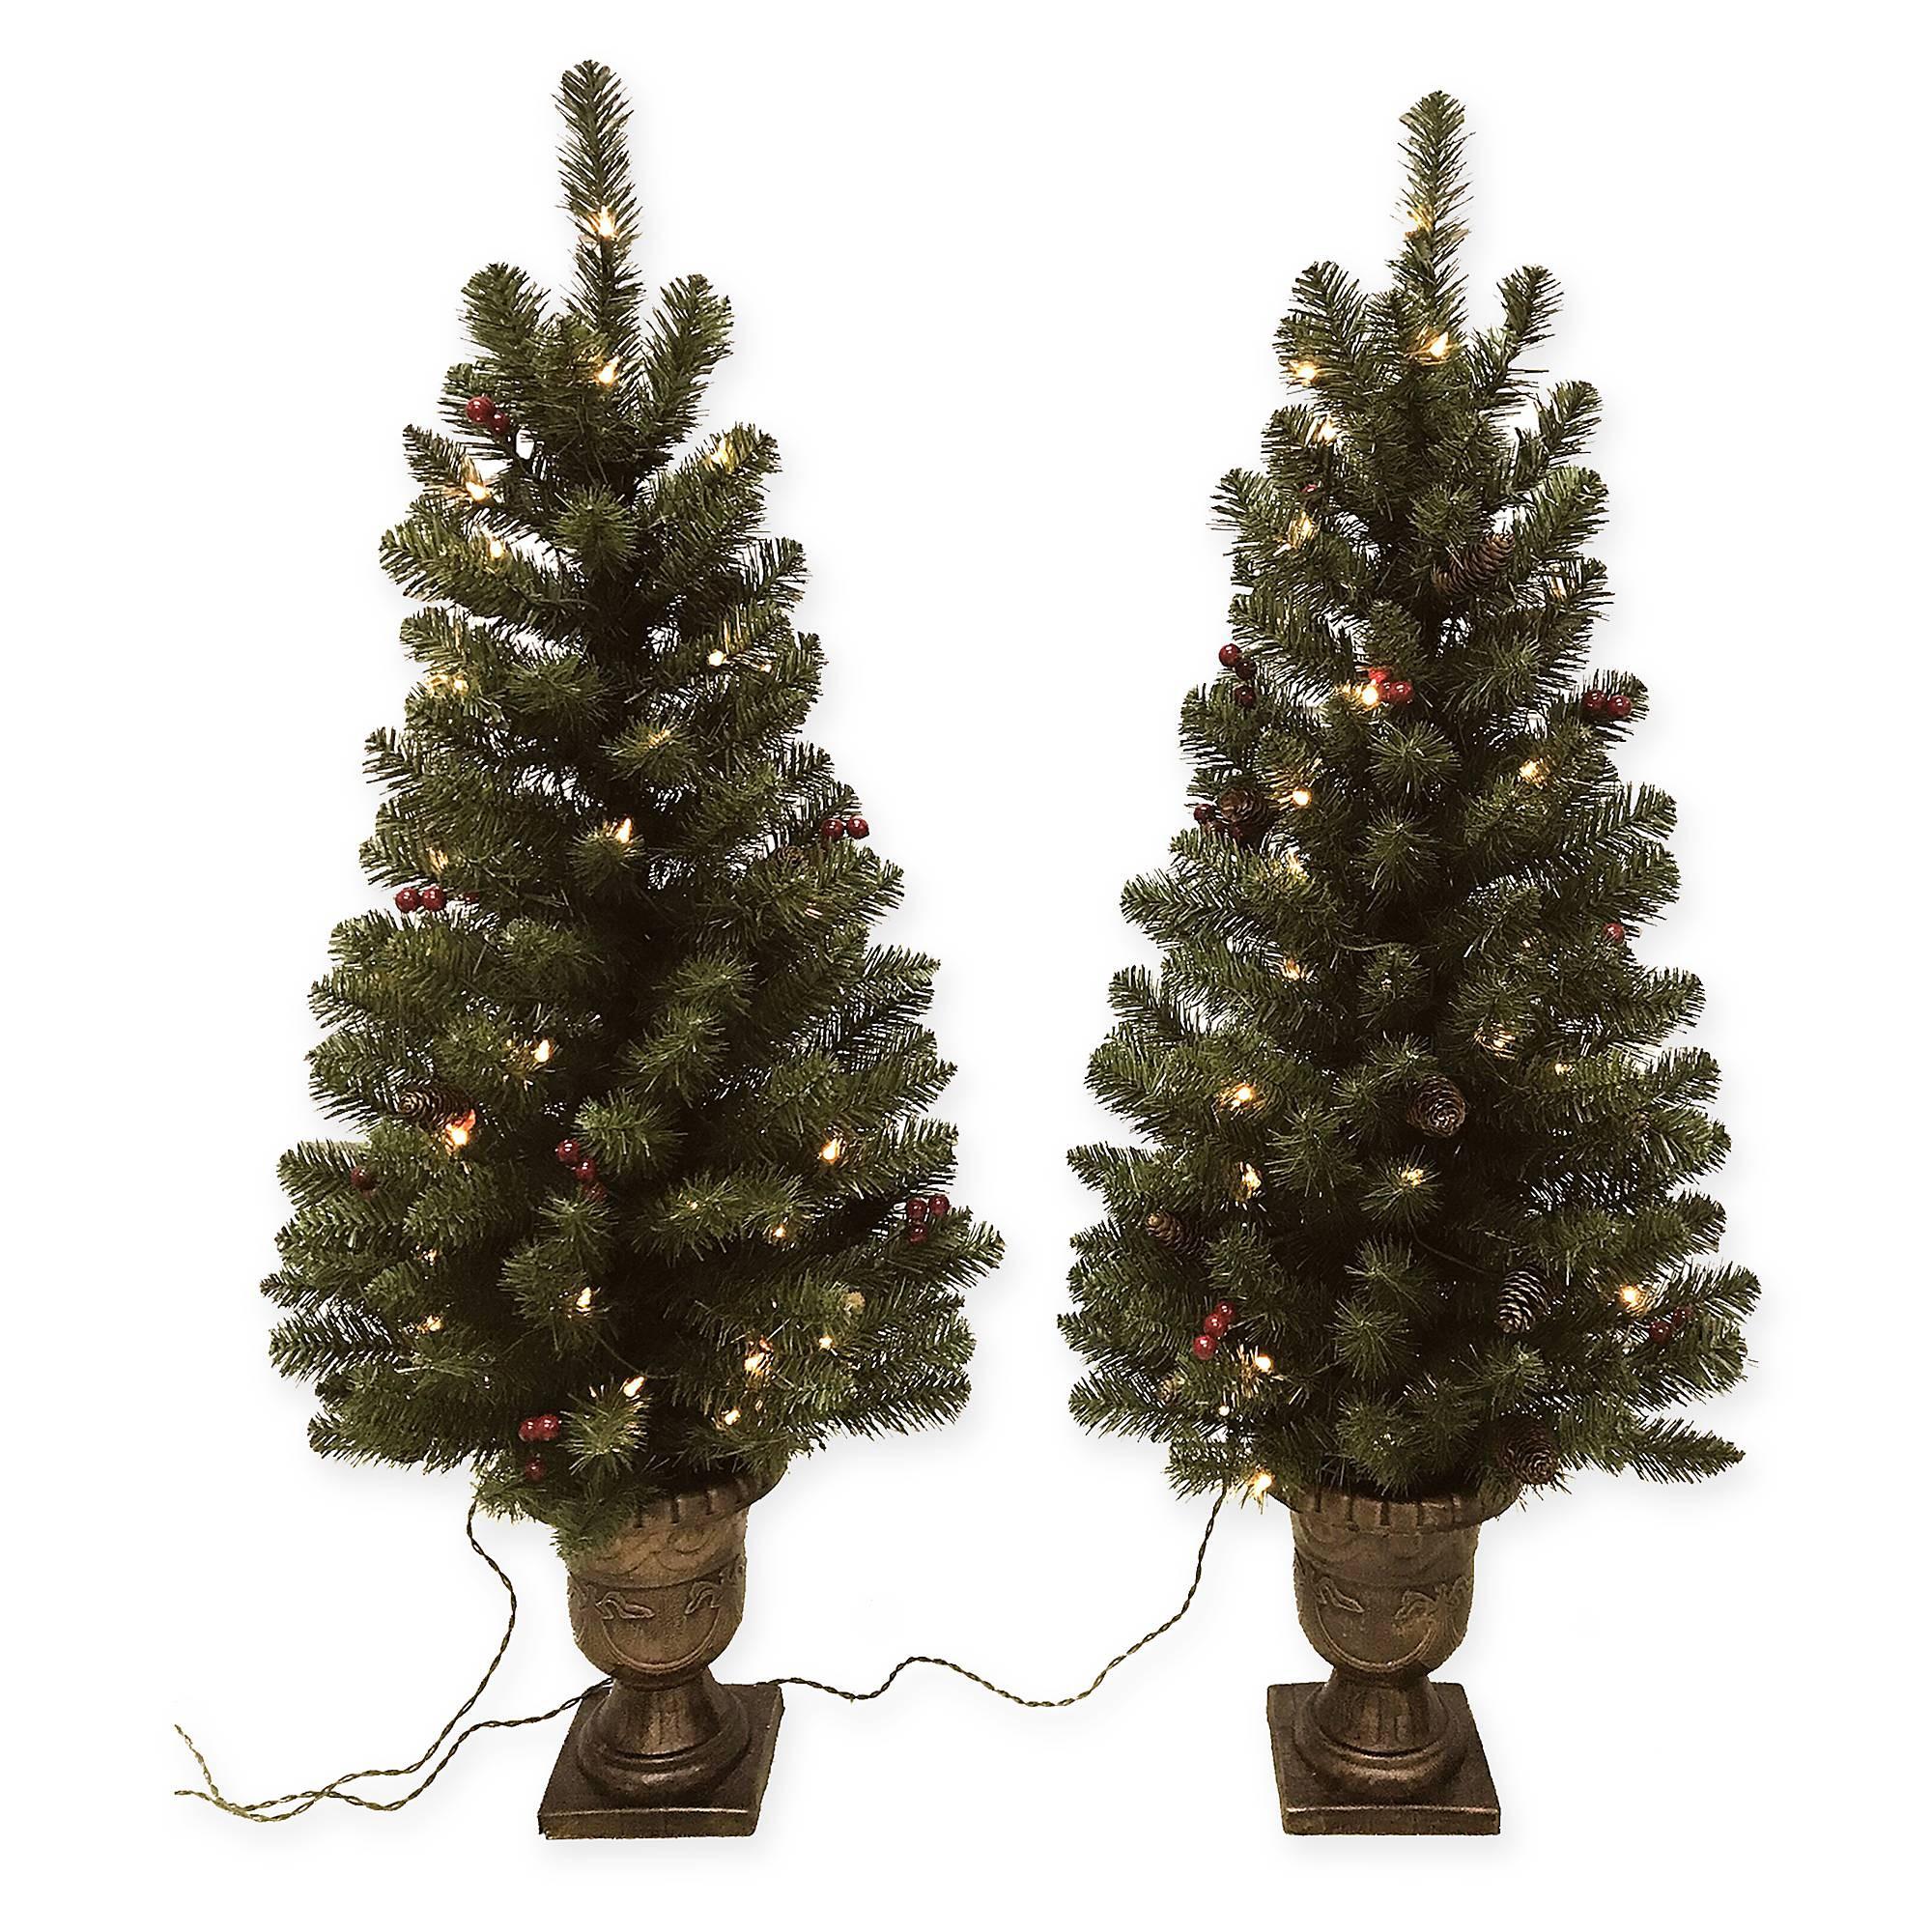 Pre Lit Porch Christmas Trees  Pine Pre Lit 4 Foot Porch Artificial Christmas Trees Set